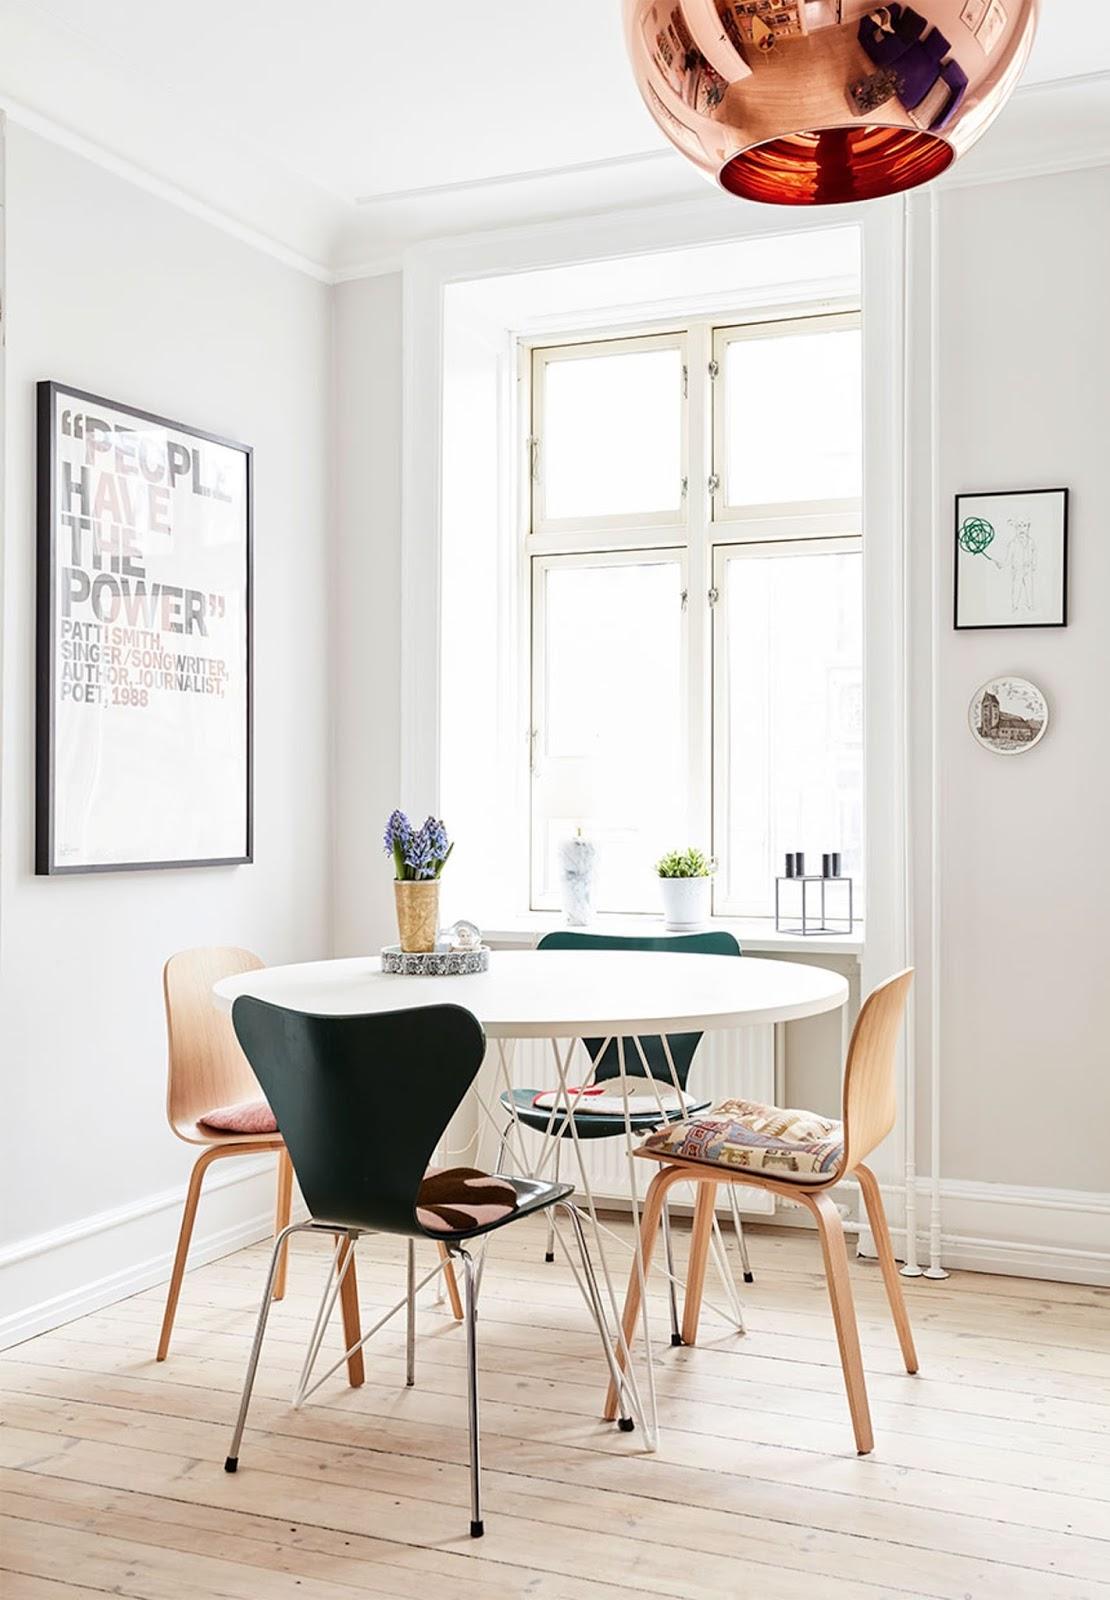 nordic design, danish design, mid century modern, arne jacobsen chair,